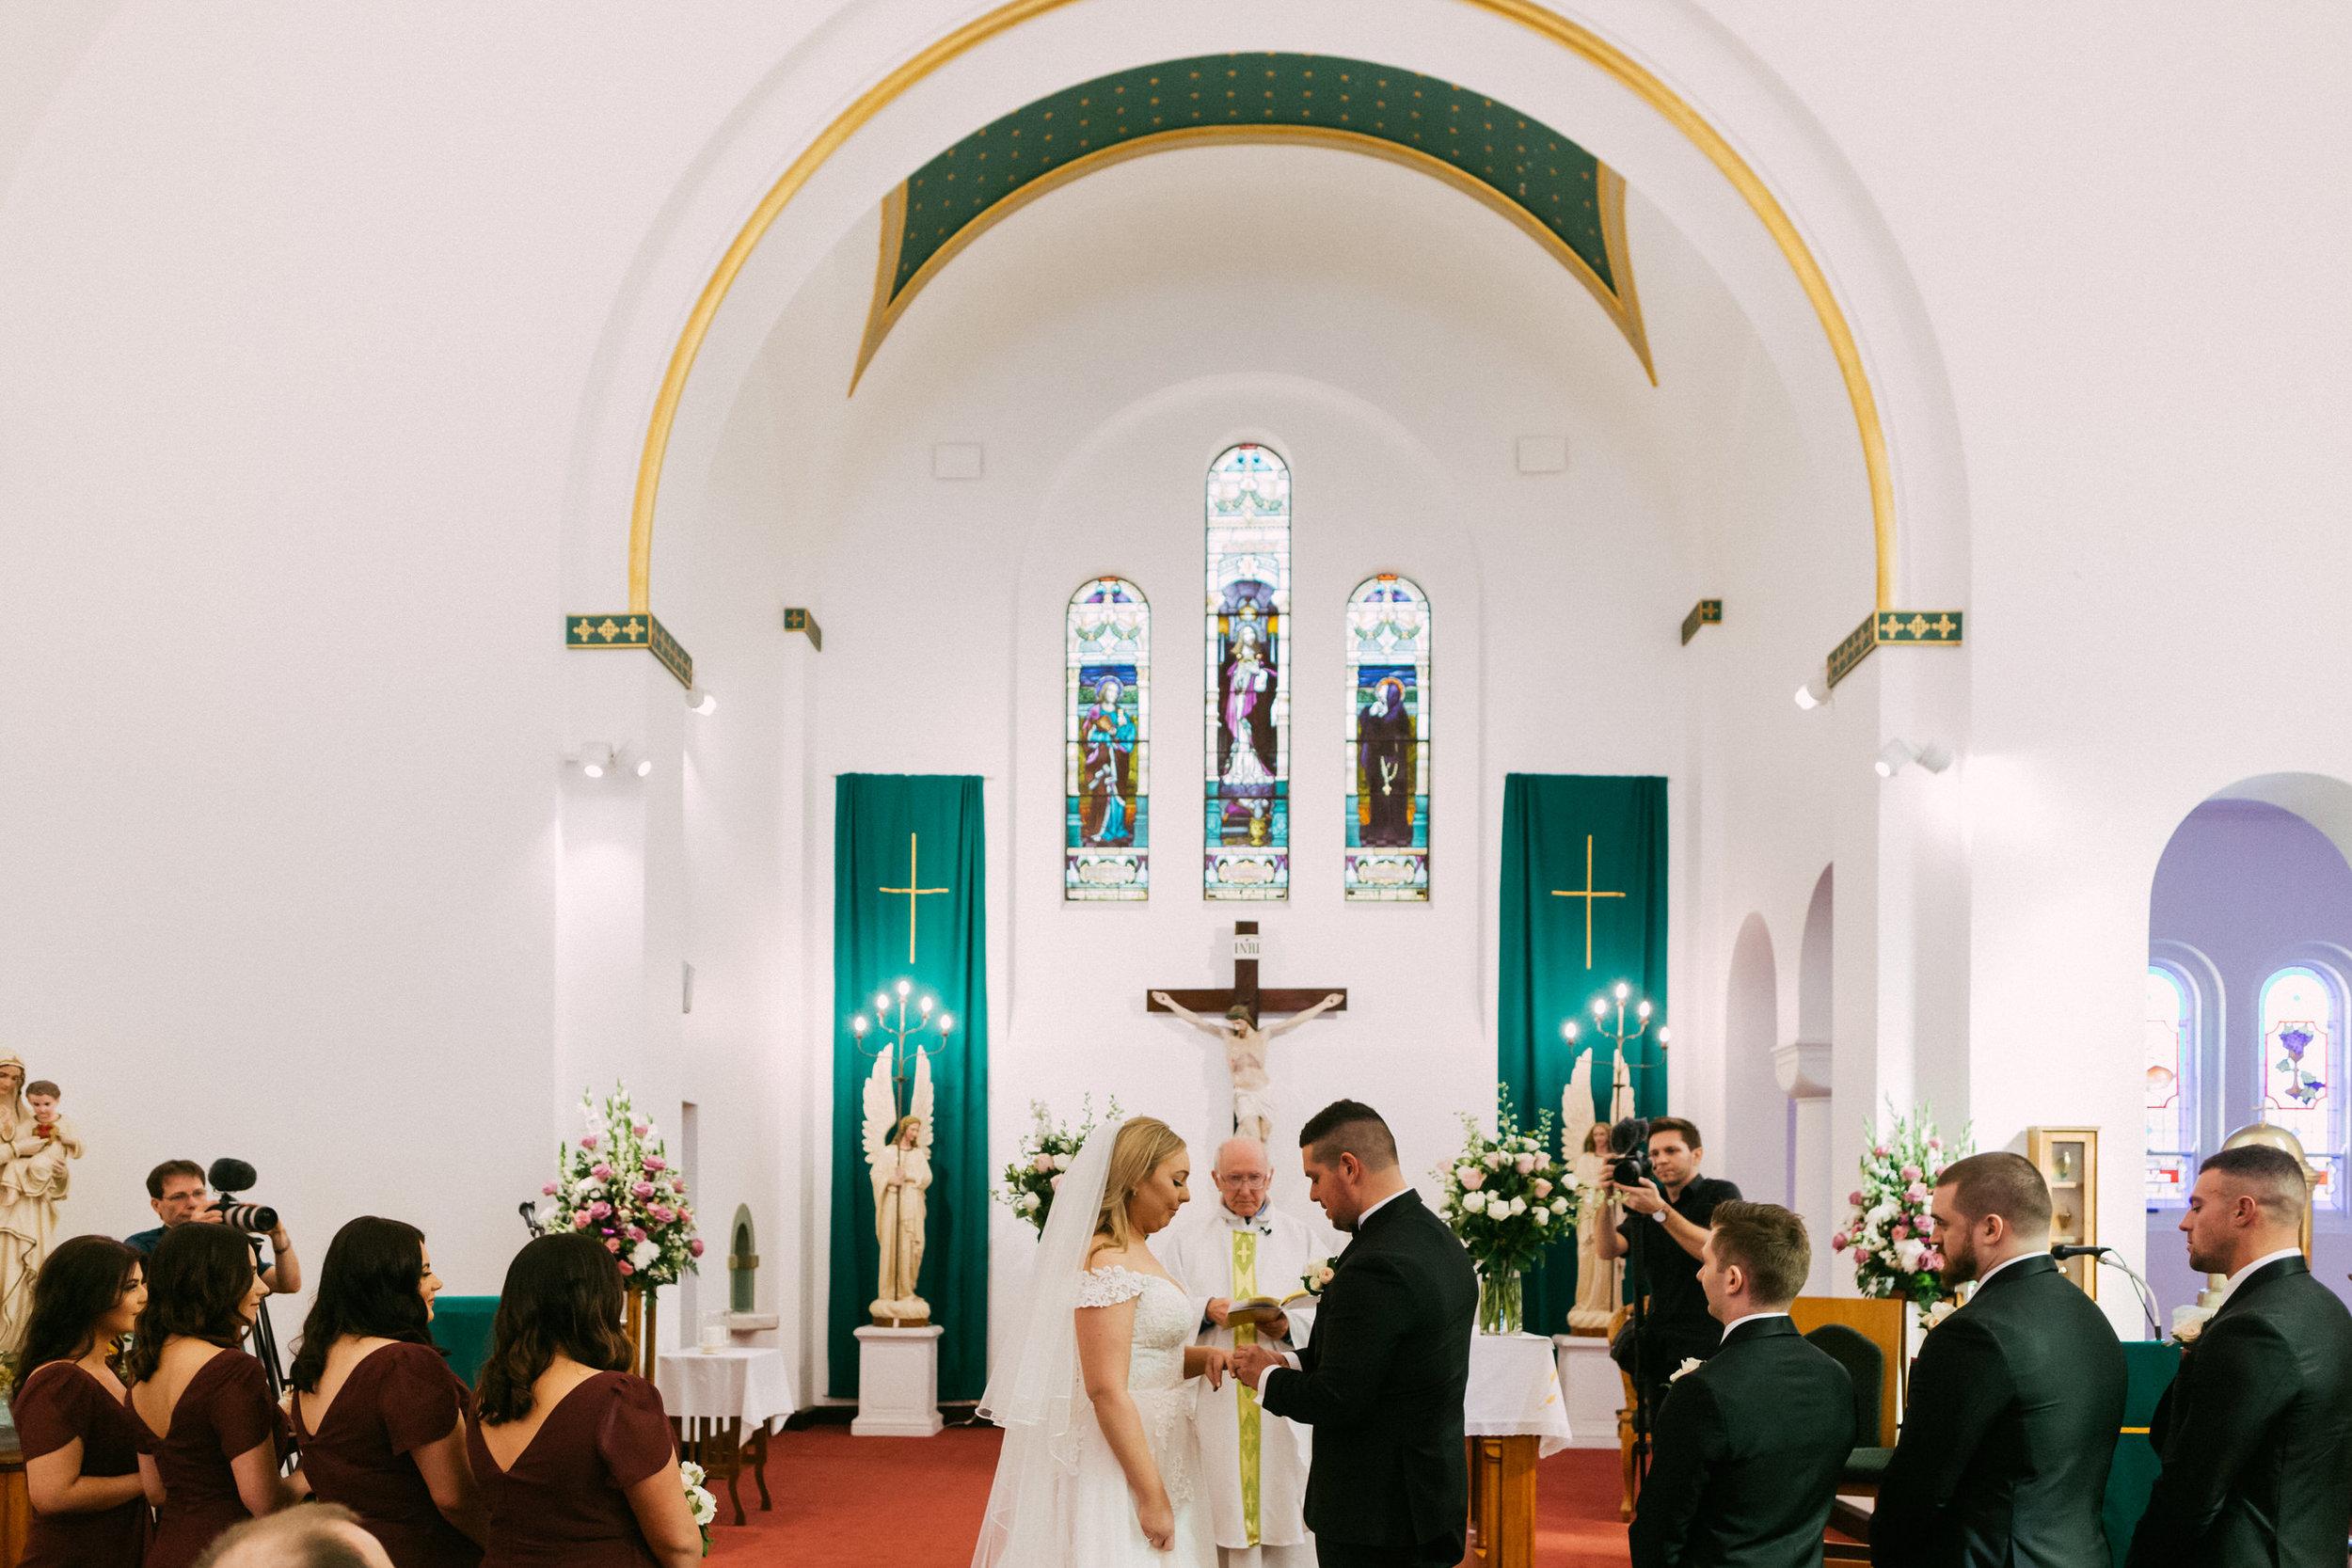 Adelaide Wedding Church Smoke Bomb Serafino 066.jpg